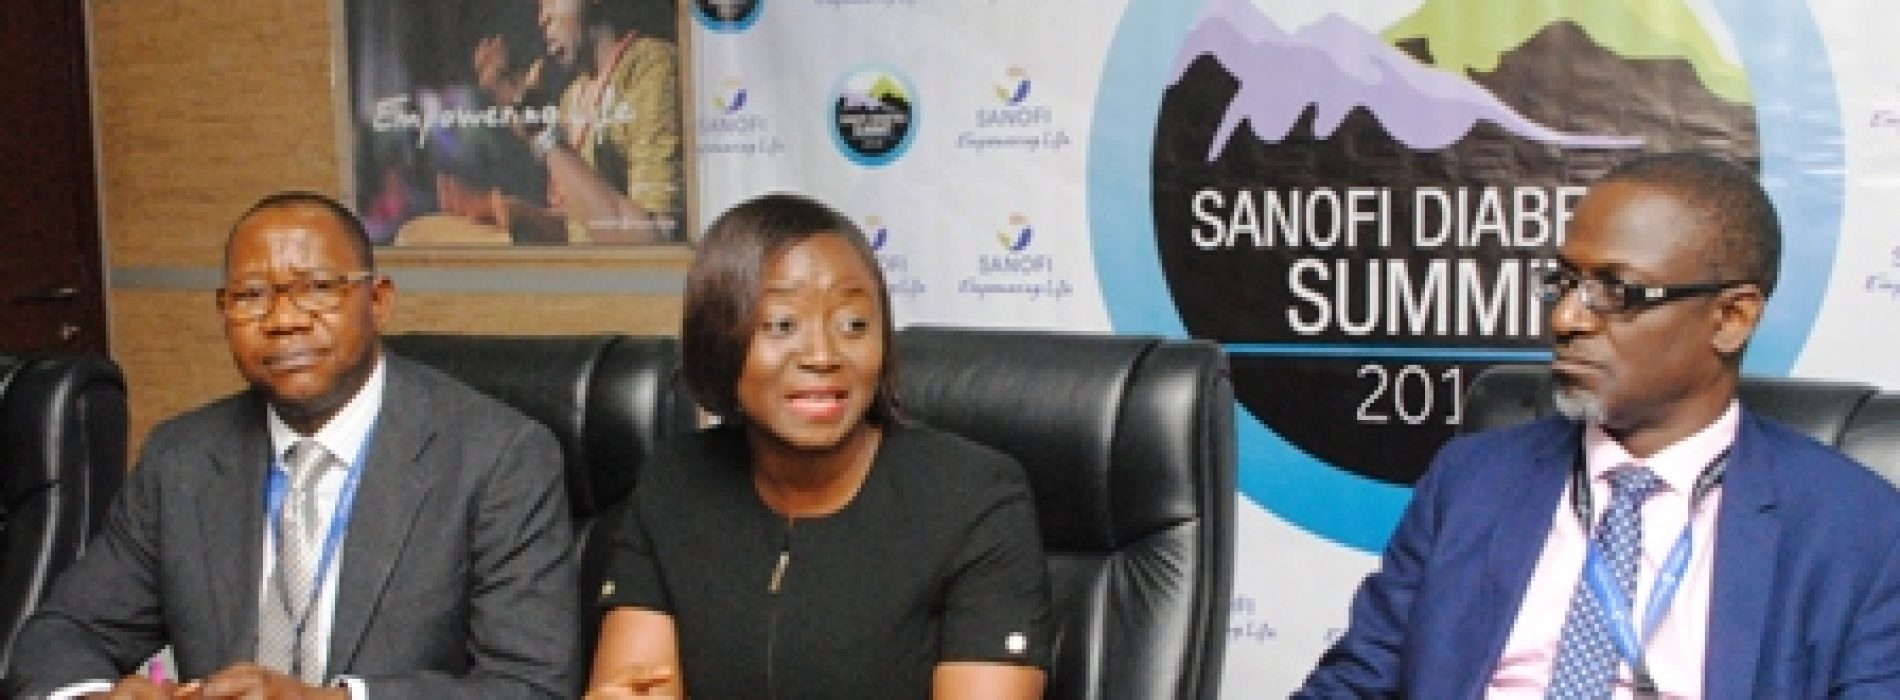 Experts storm Lagos for Sanofi Diabetes Summit